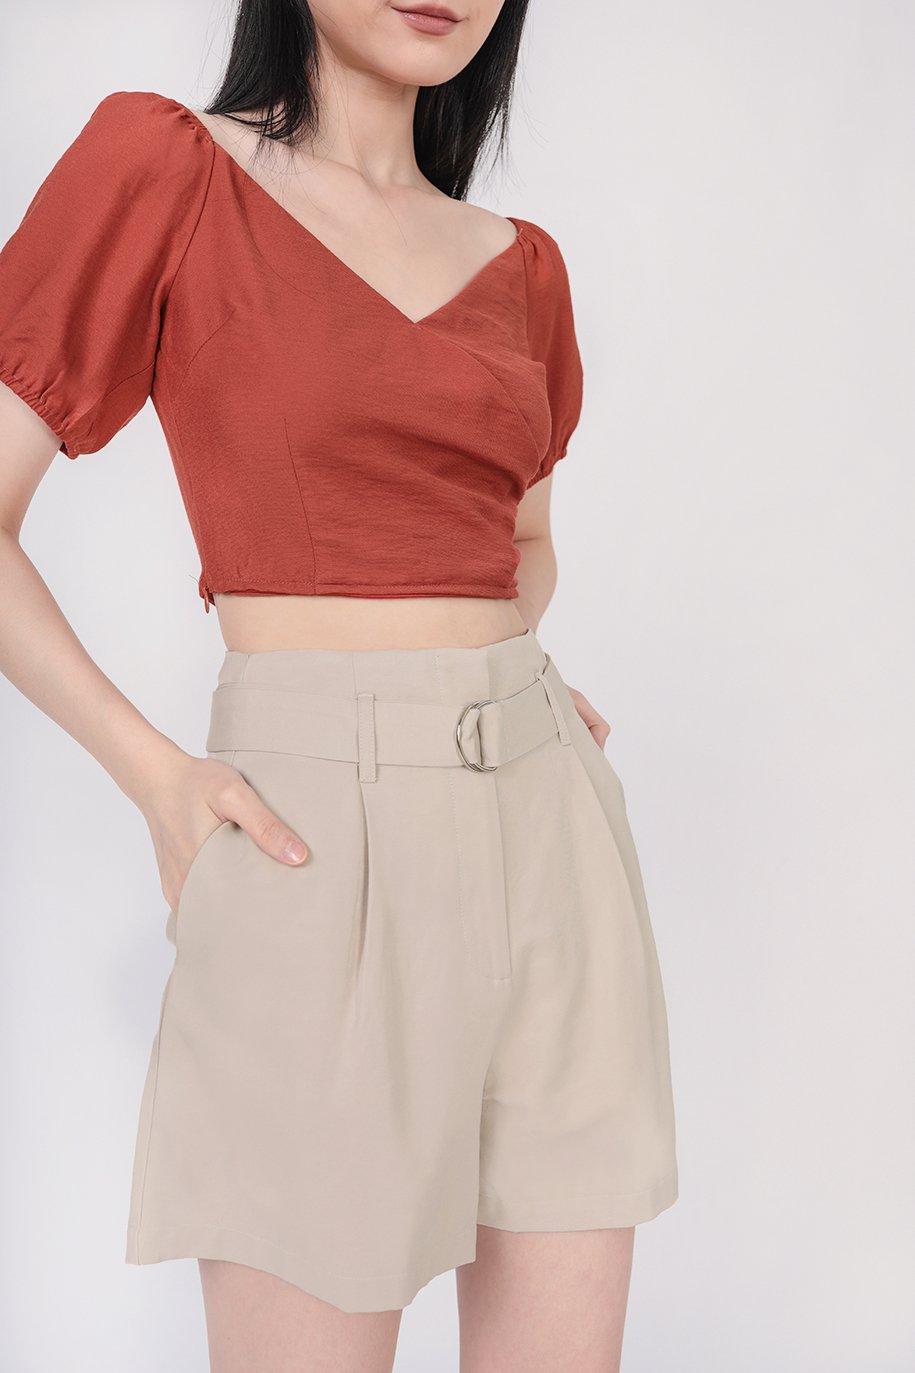 Harris Belted Shorts (Beige)